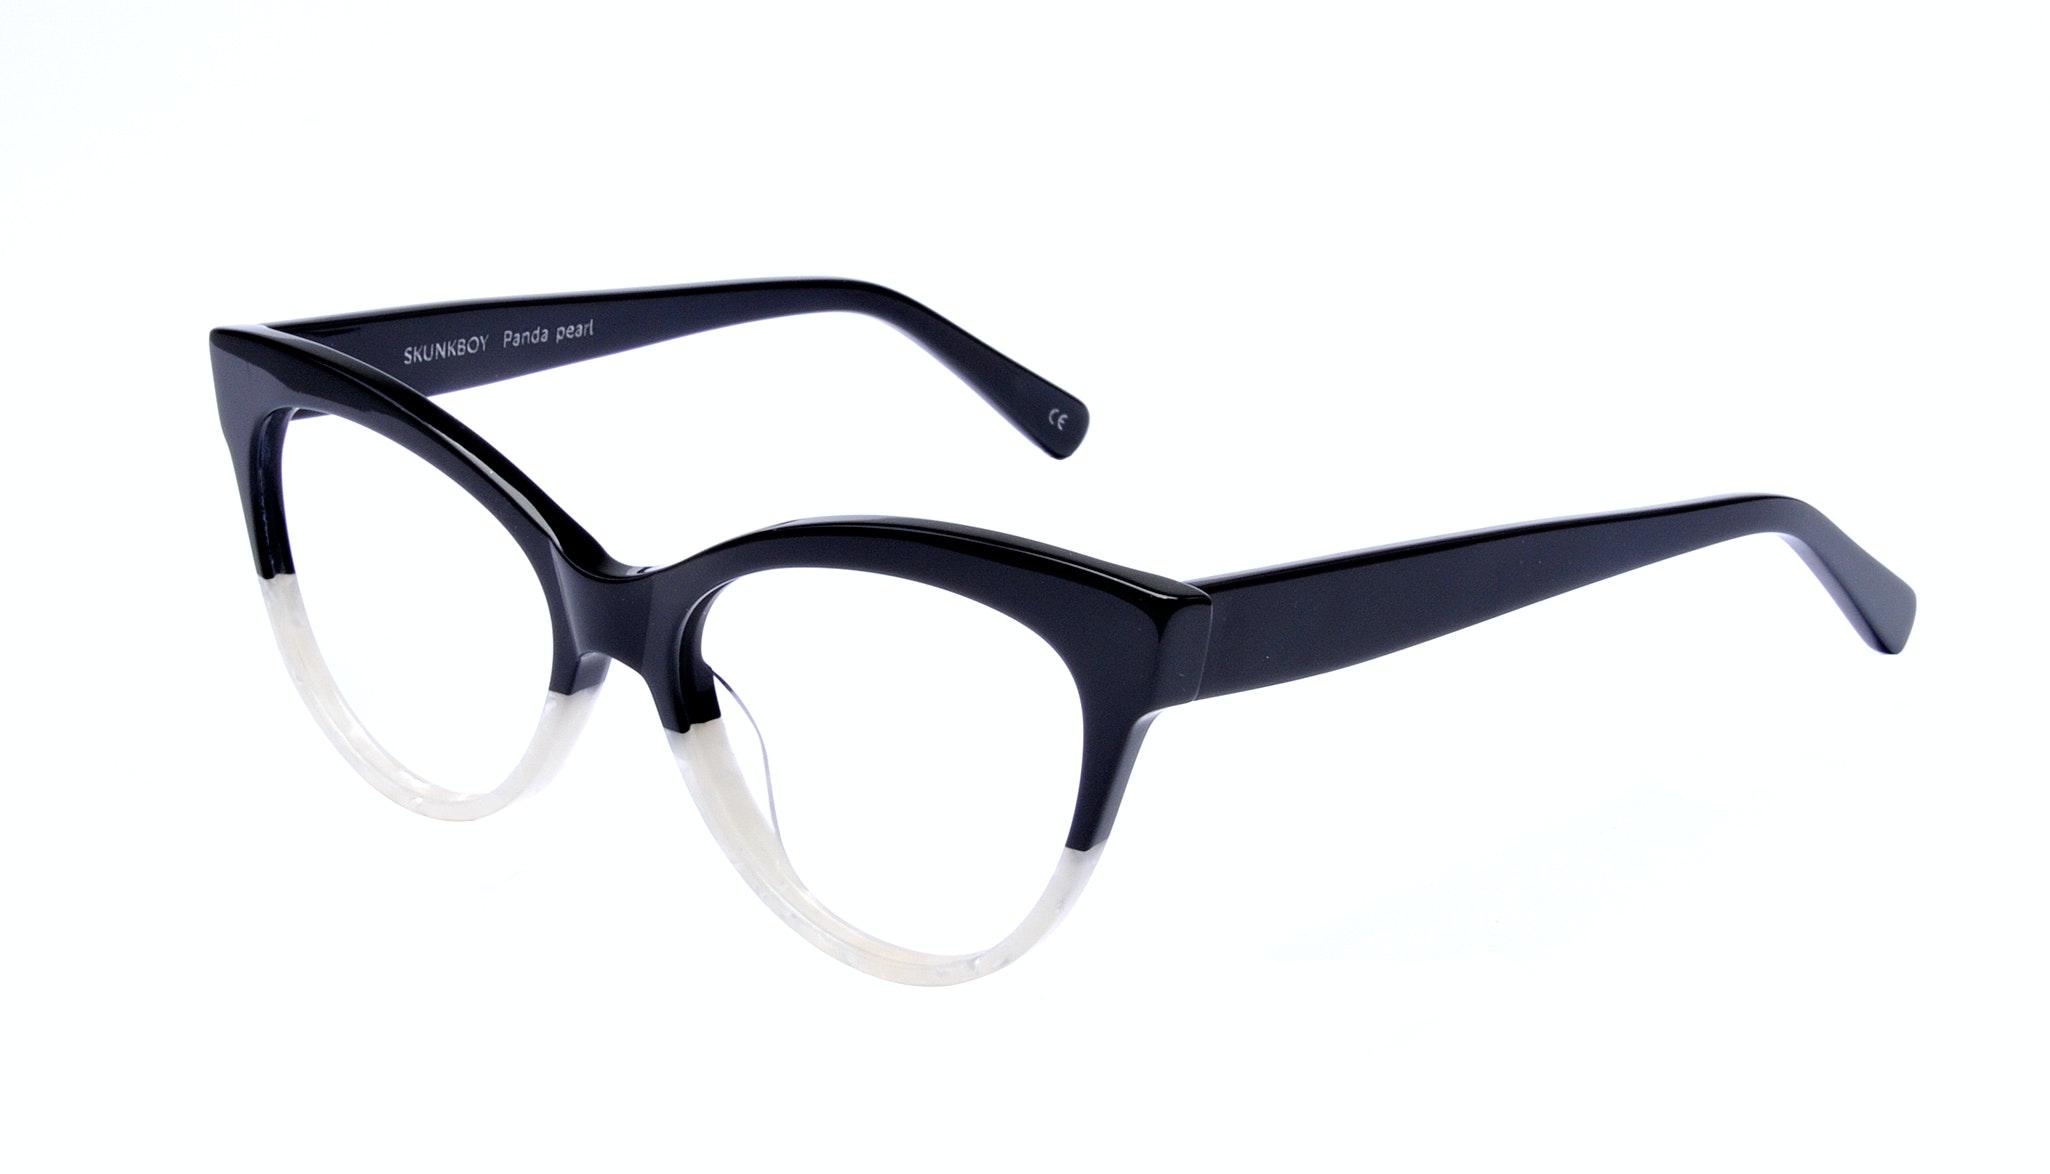 Affordable Fashion Glasses Cat Eye Square Eyeglasses Women SkunkBoy Panda Pearl Tilt